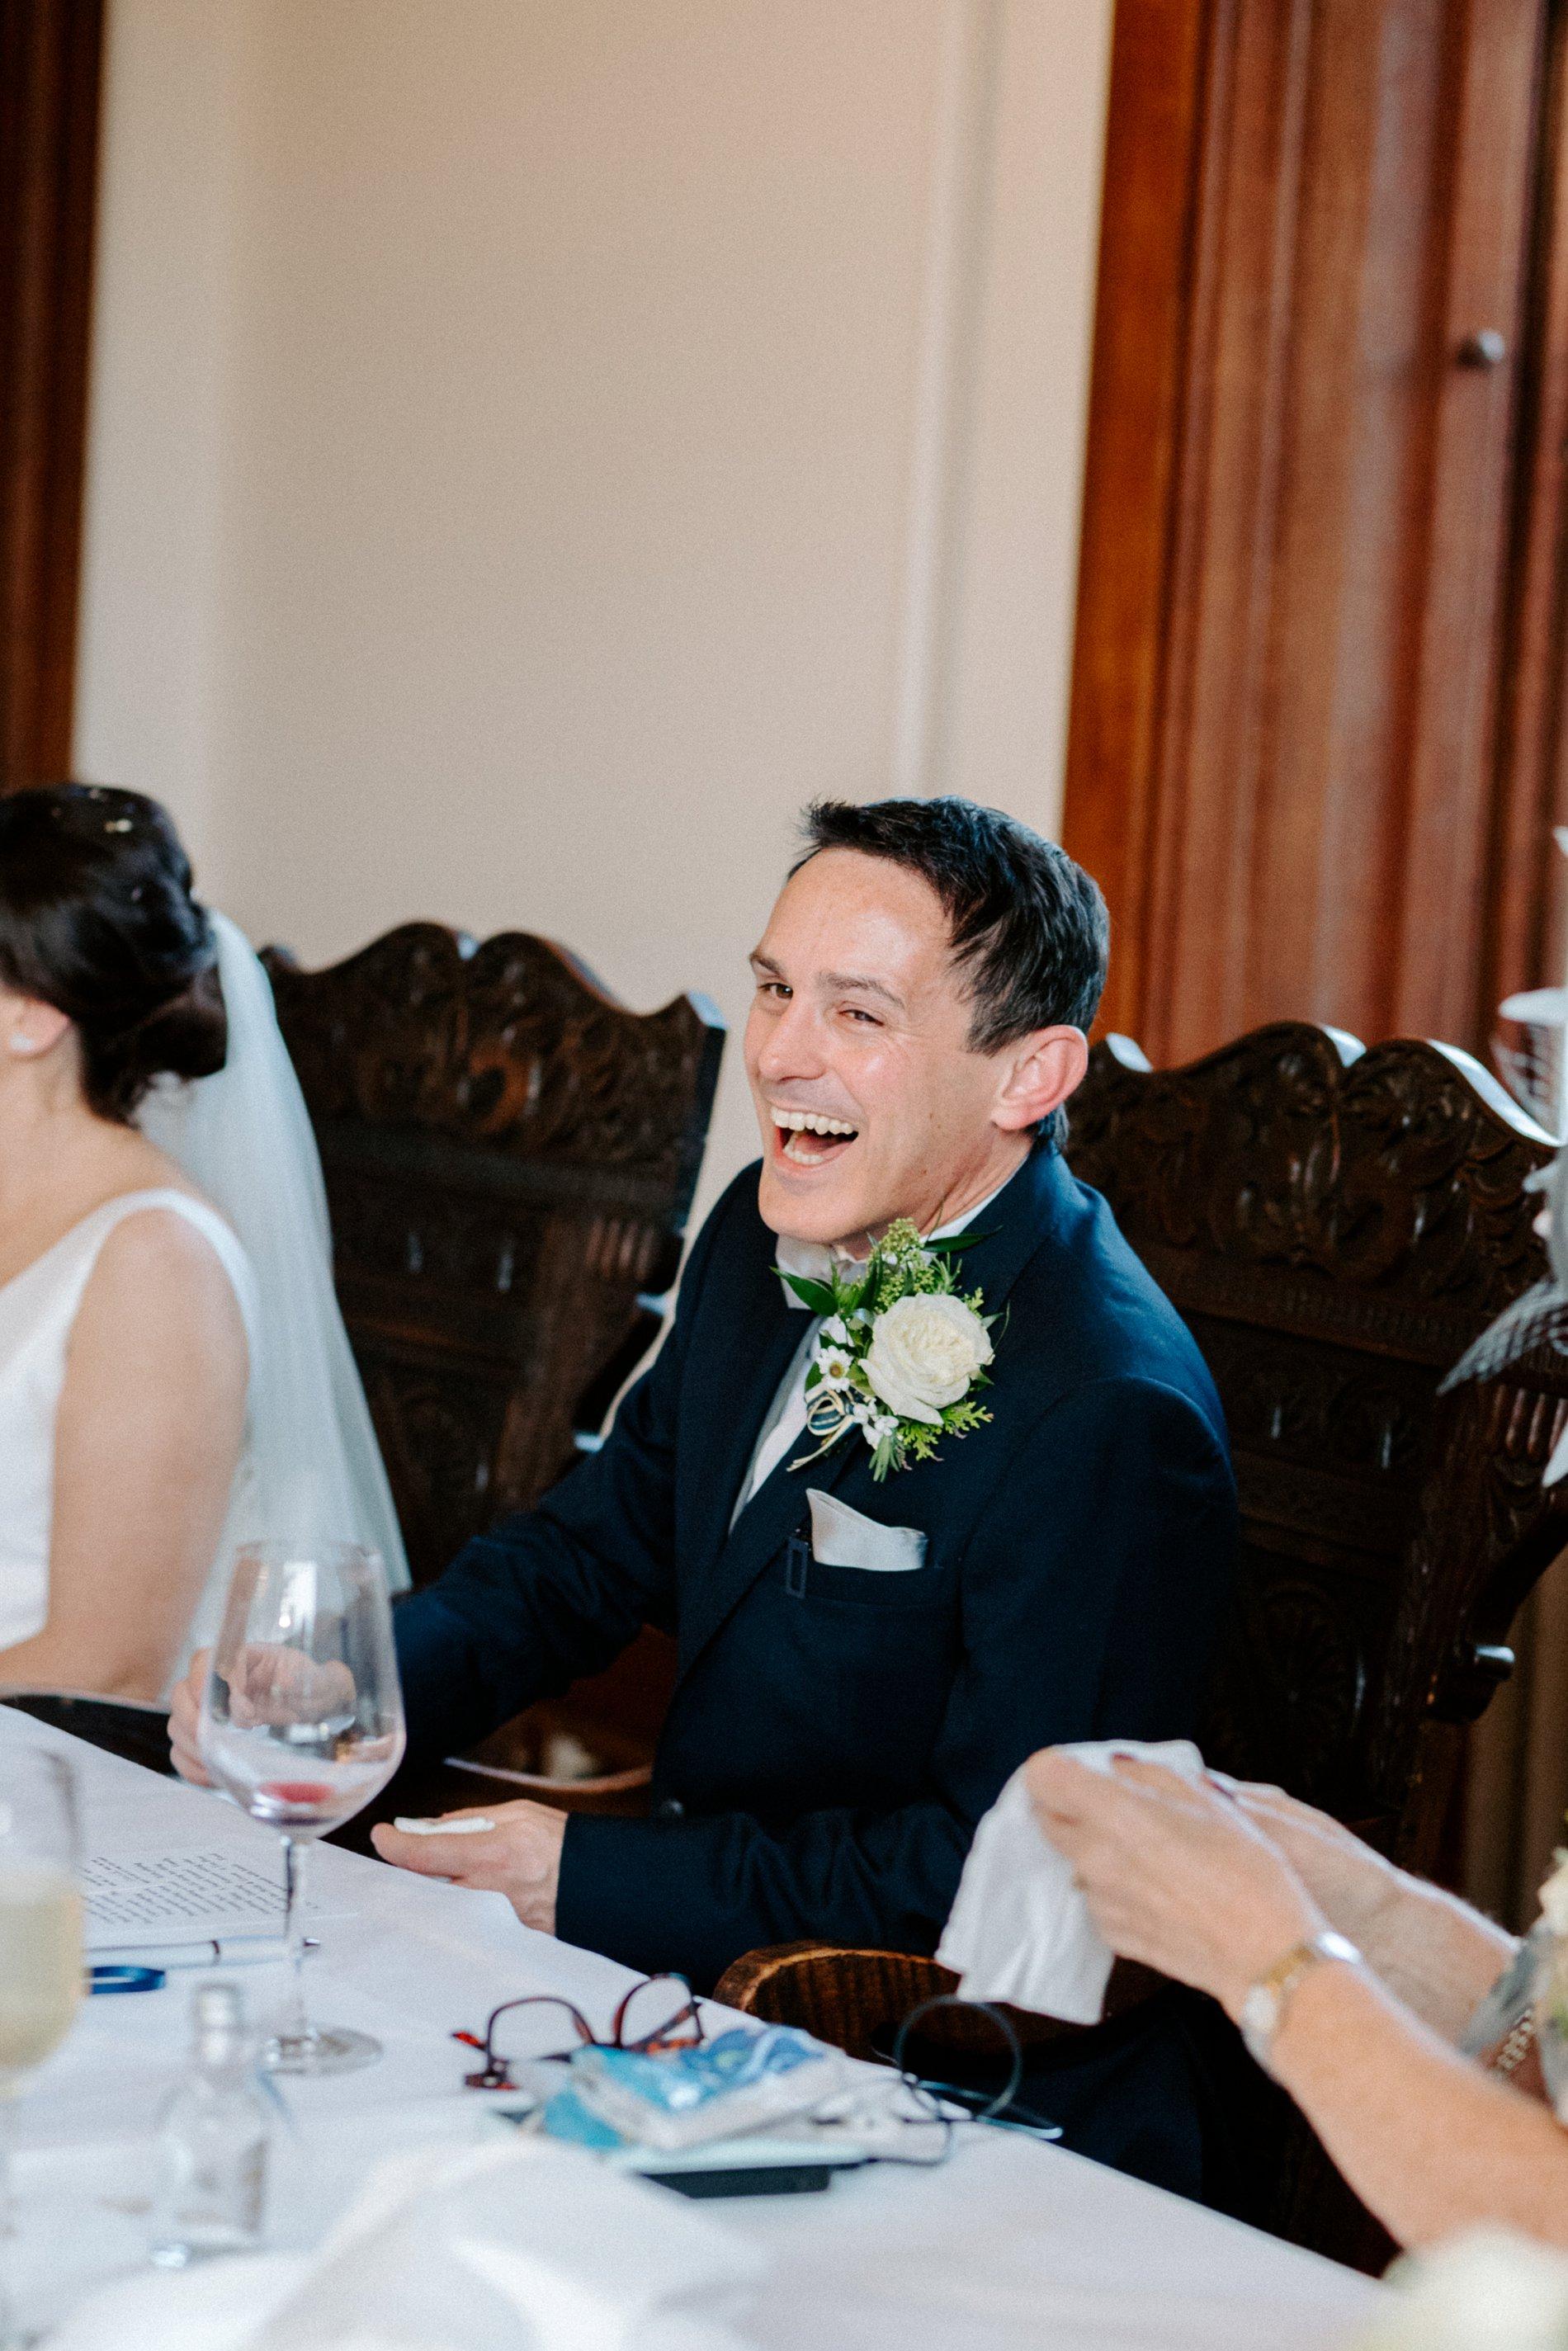 An Elegant White Wedding at Thicket Priory (c) Carla Whittingham Photography (74)